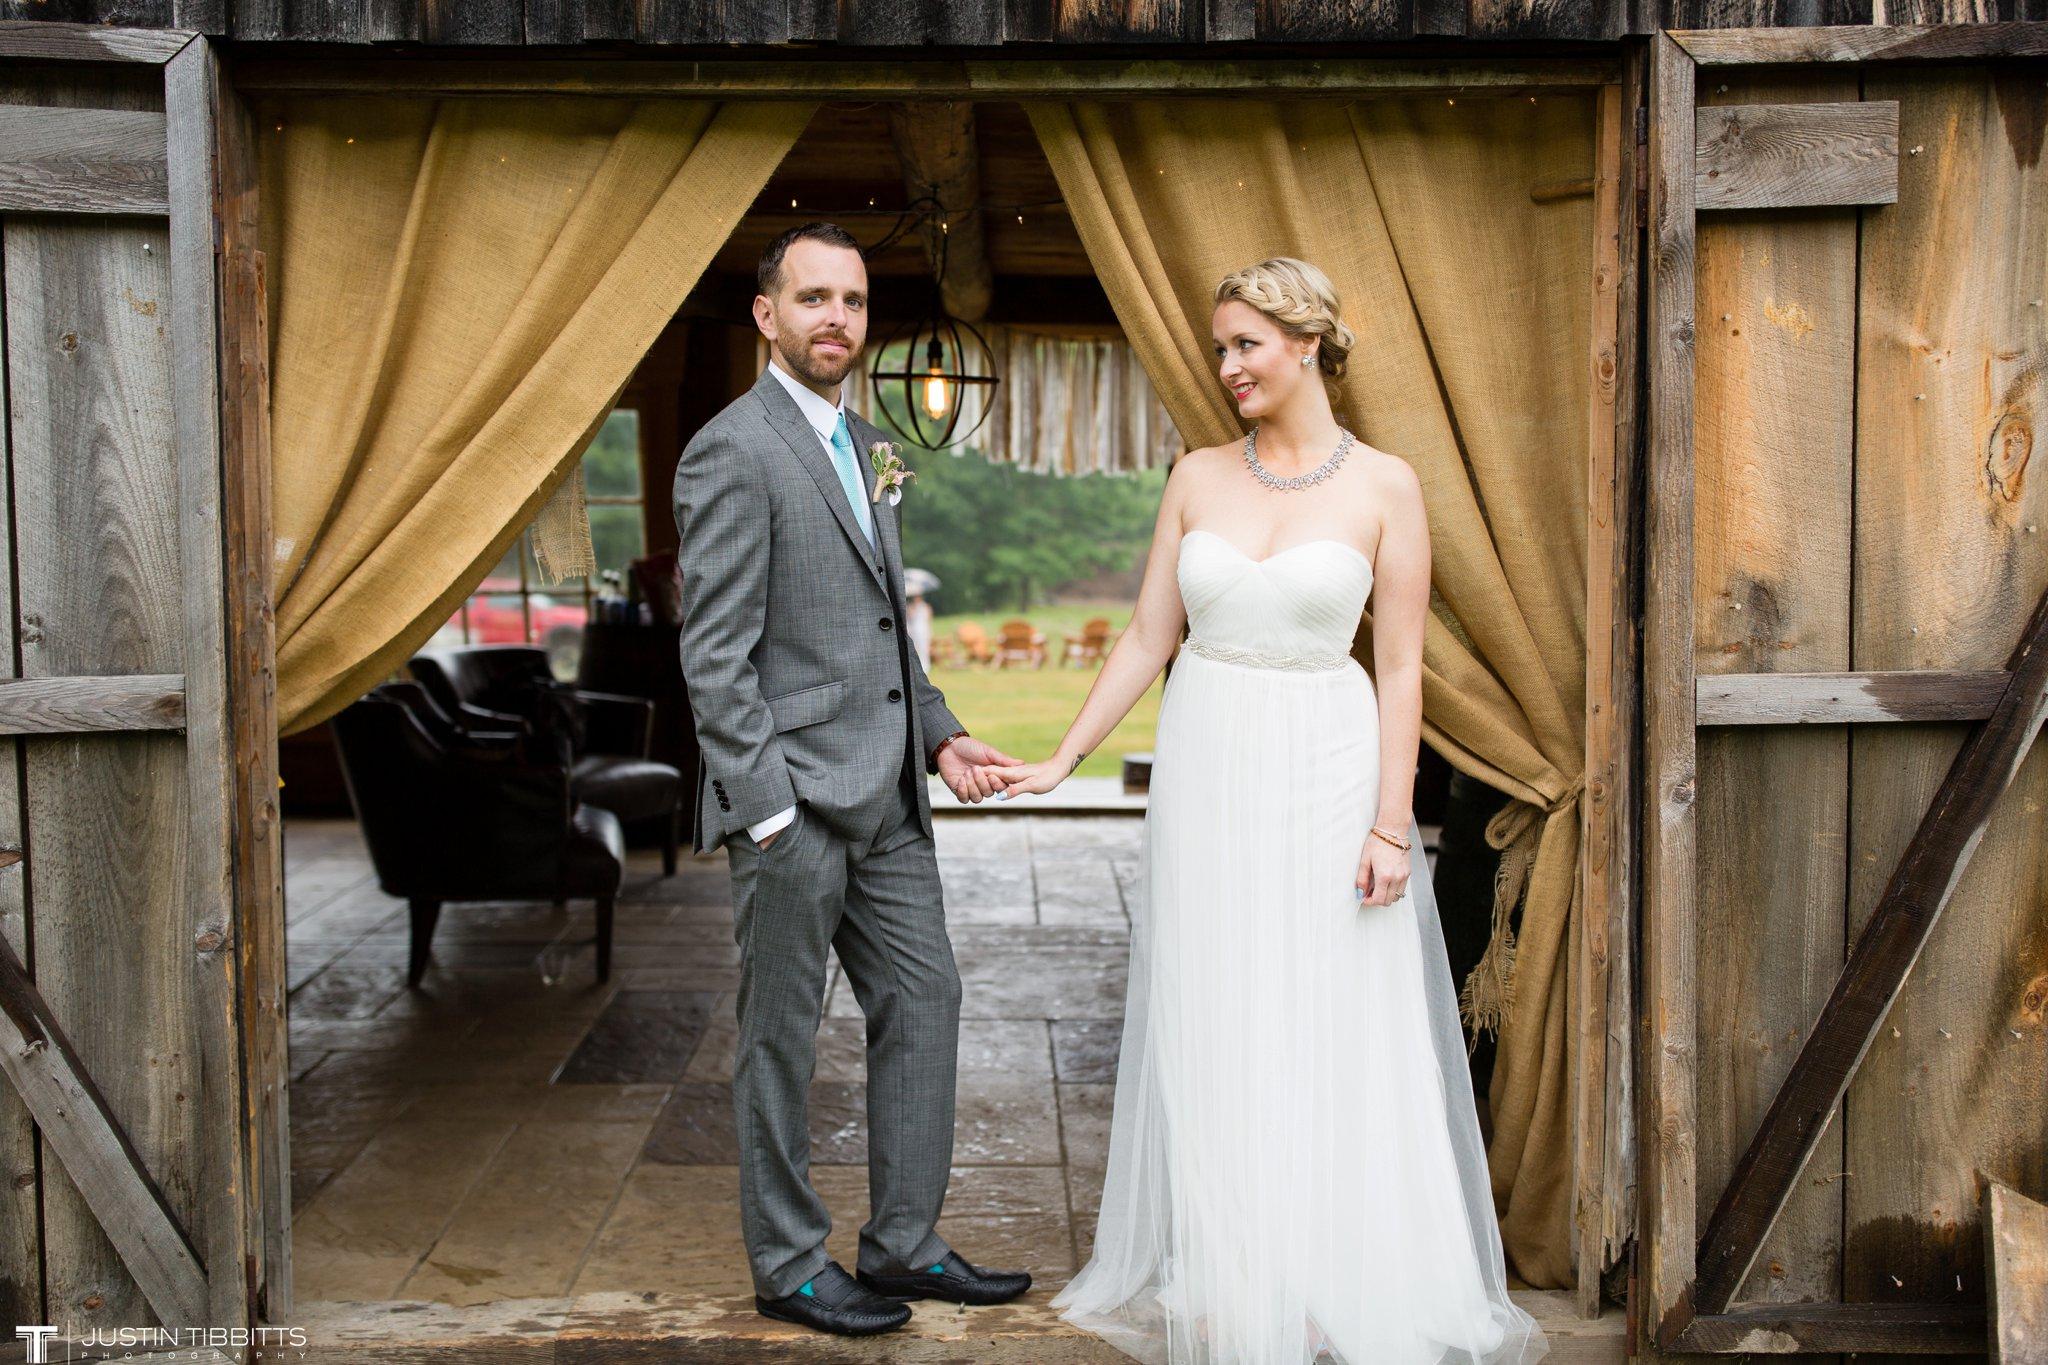 burlap-and-beams-wedding-photos-with-joran-and-molly_0094